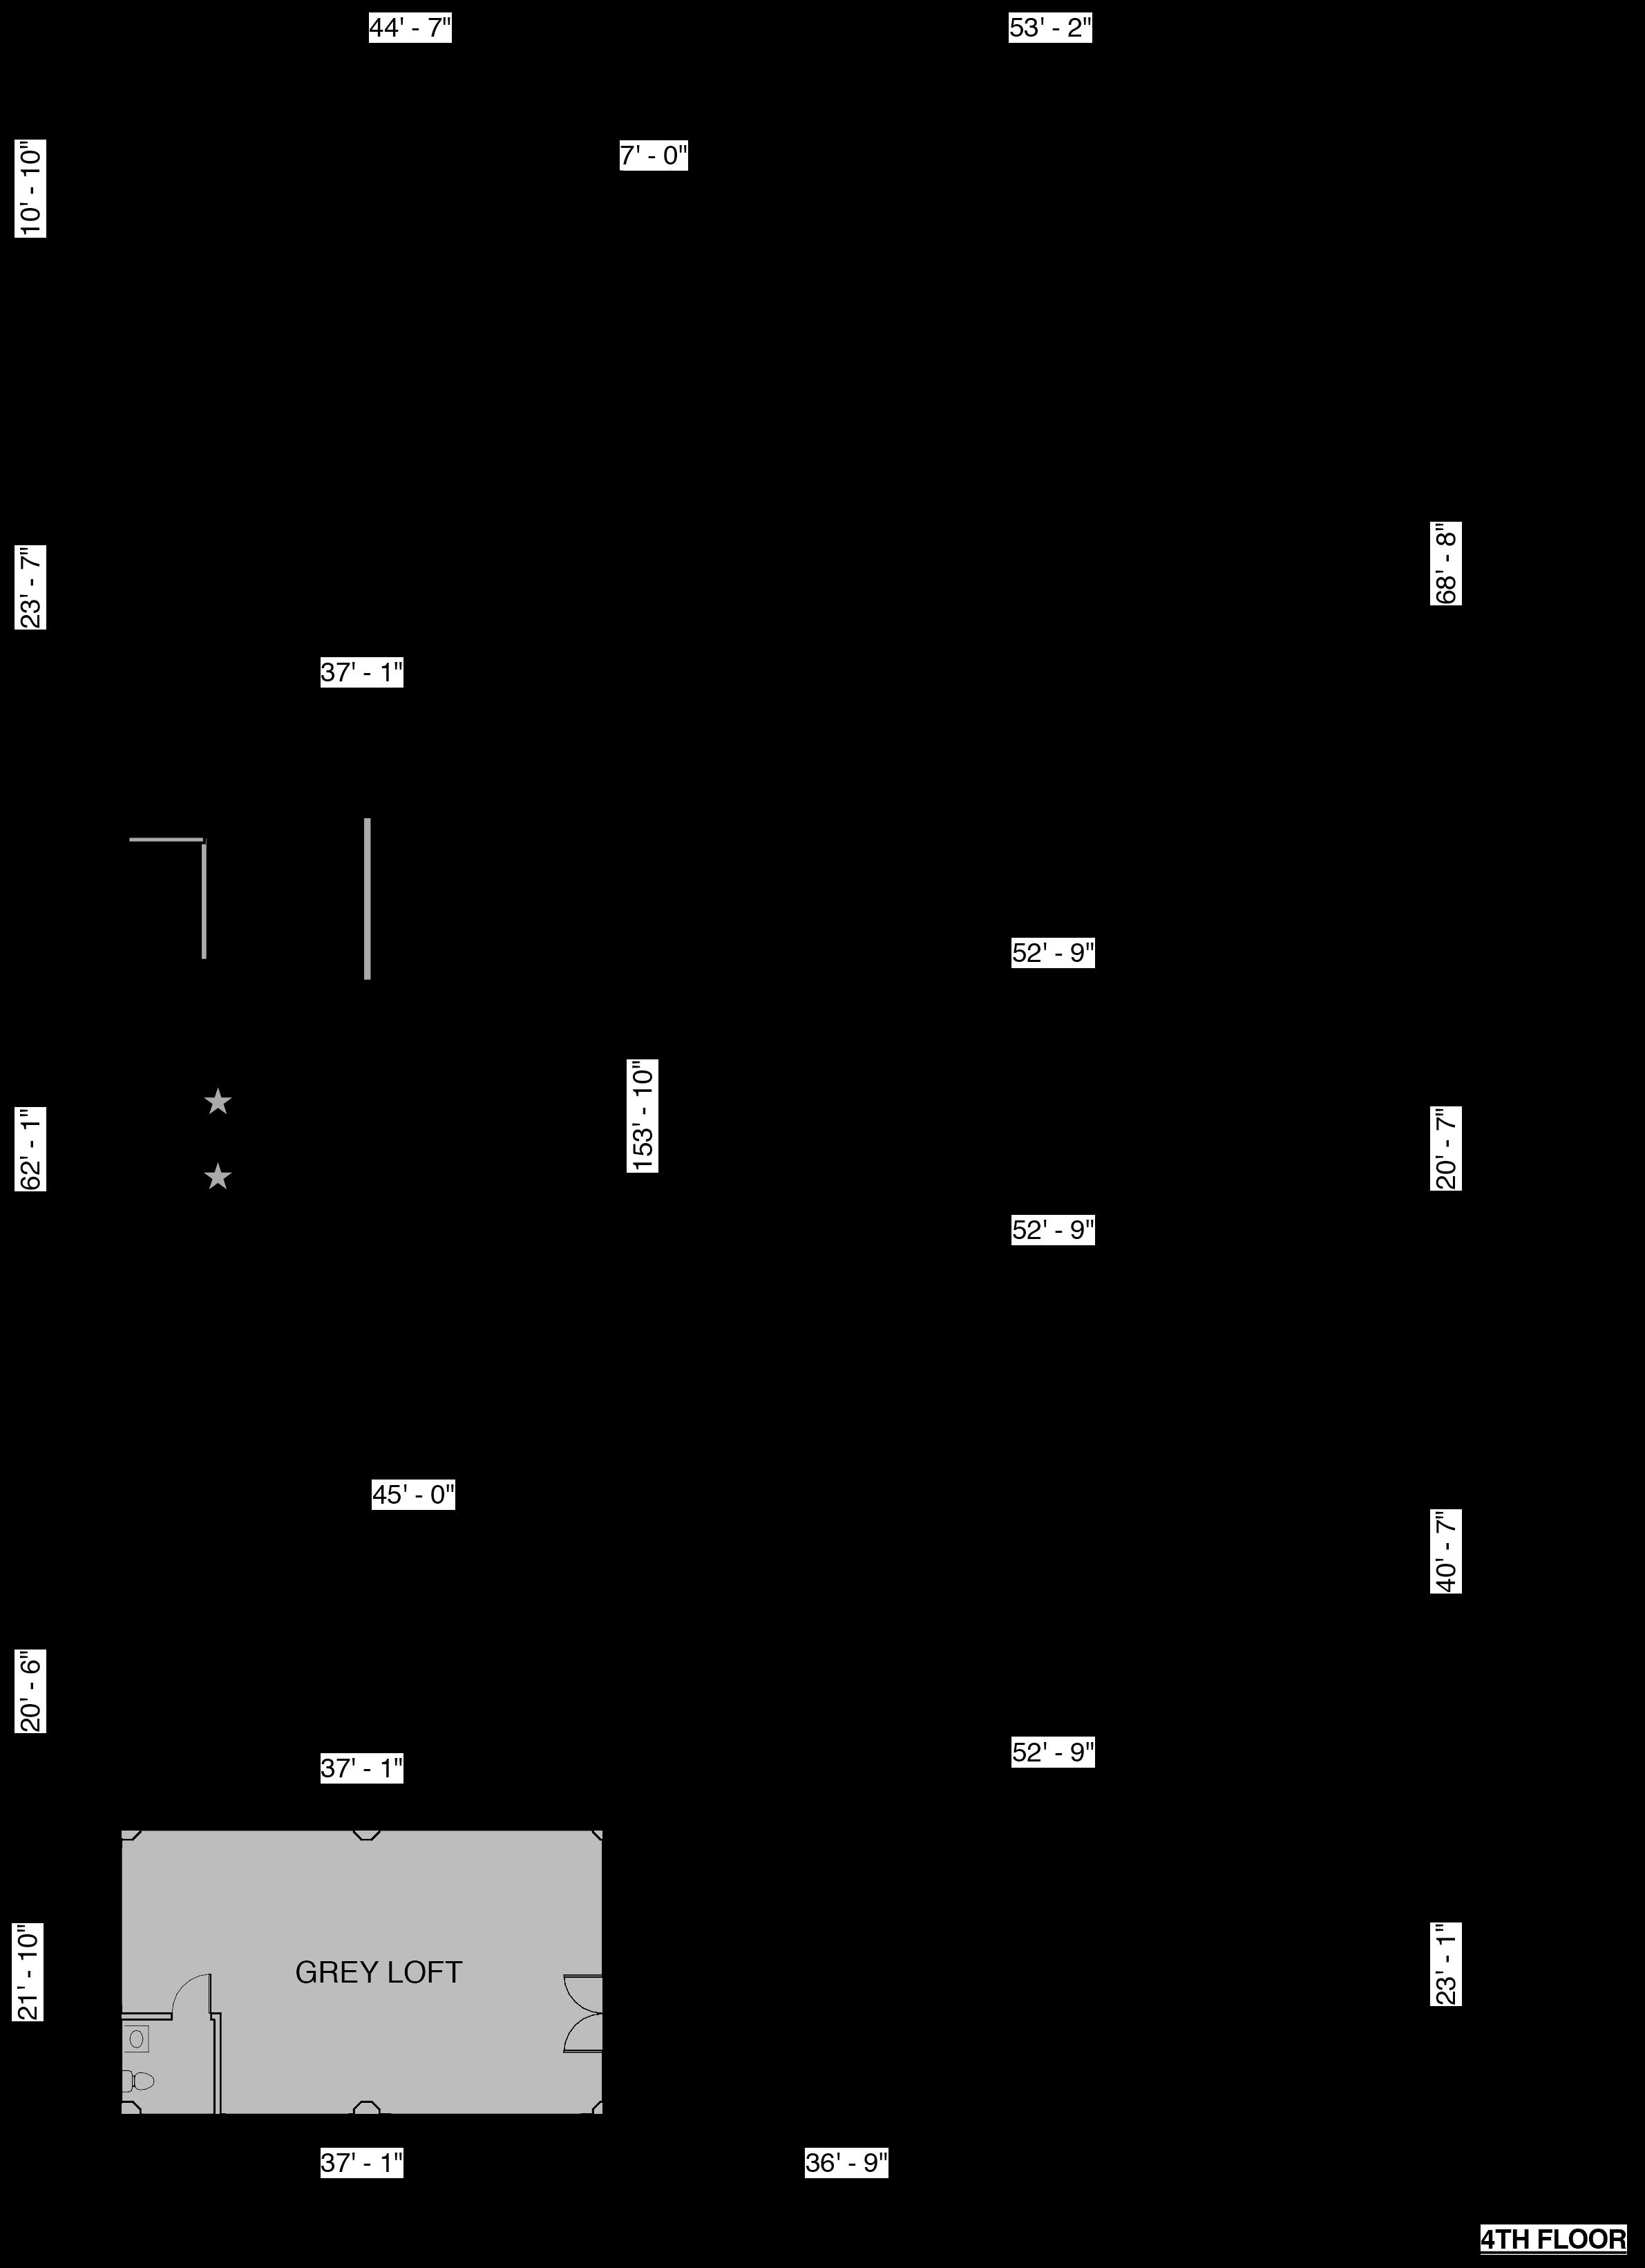 4thFloor_Schematic_HL-shelving copyGL.png